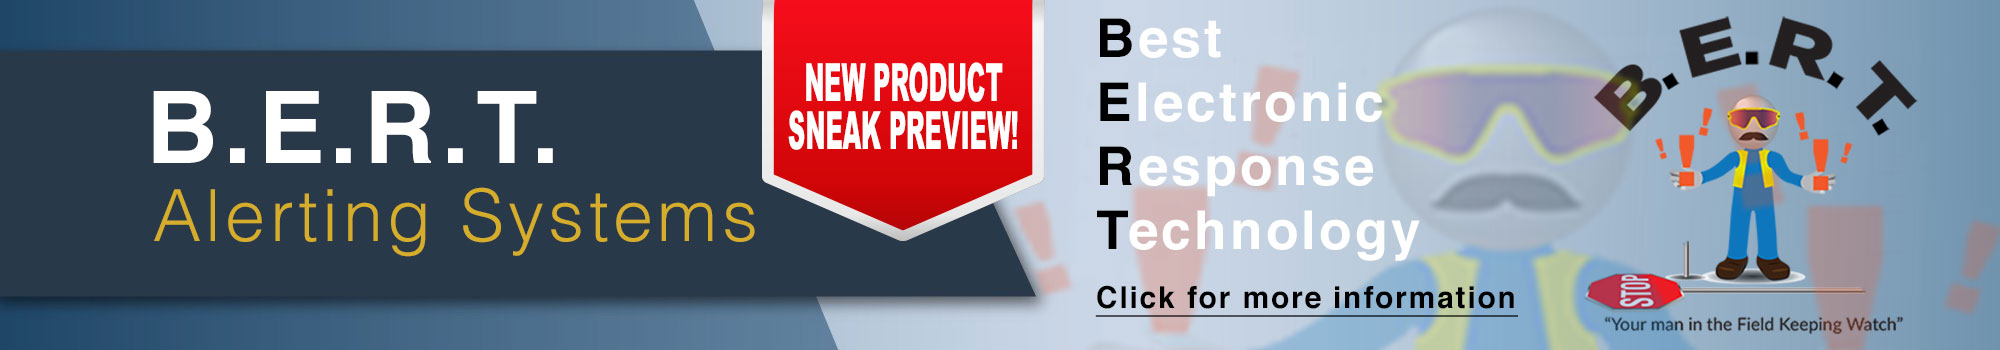 designovations-bert2